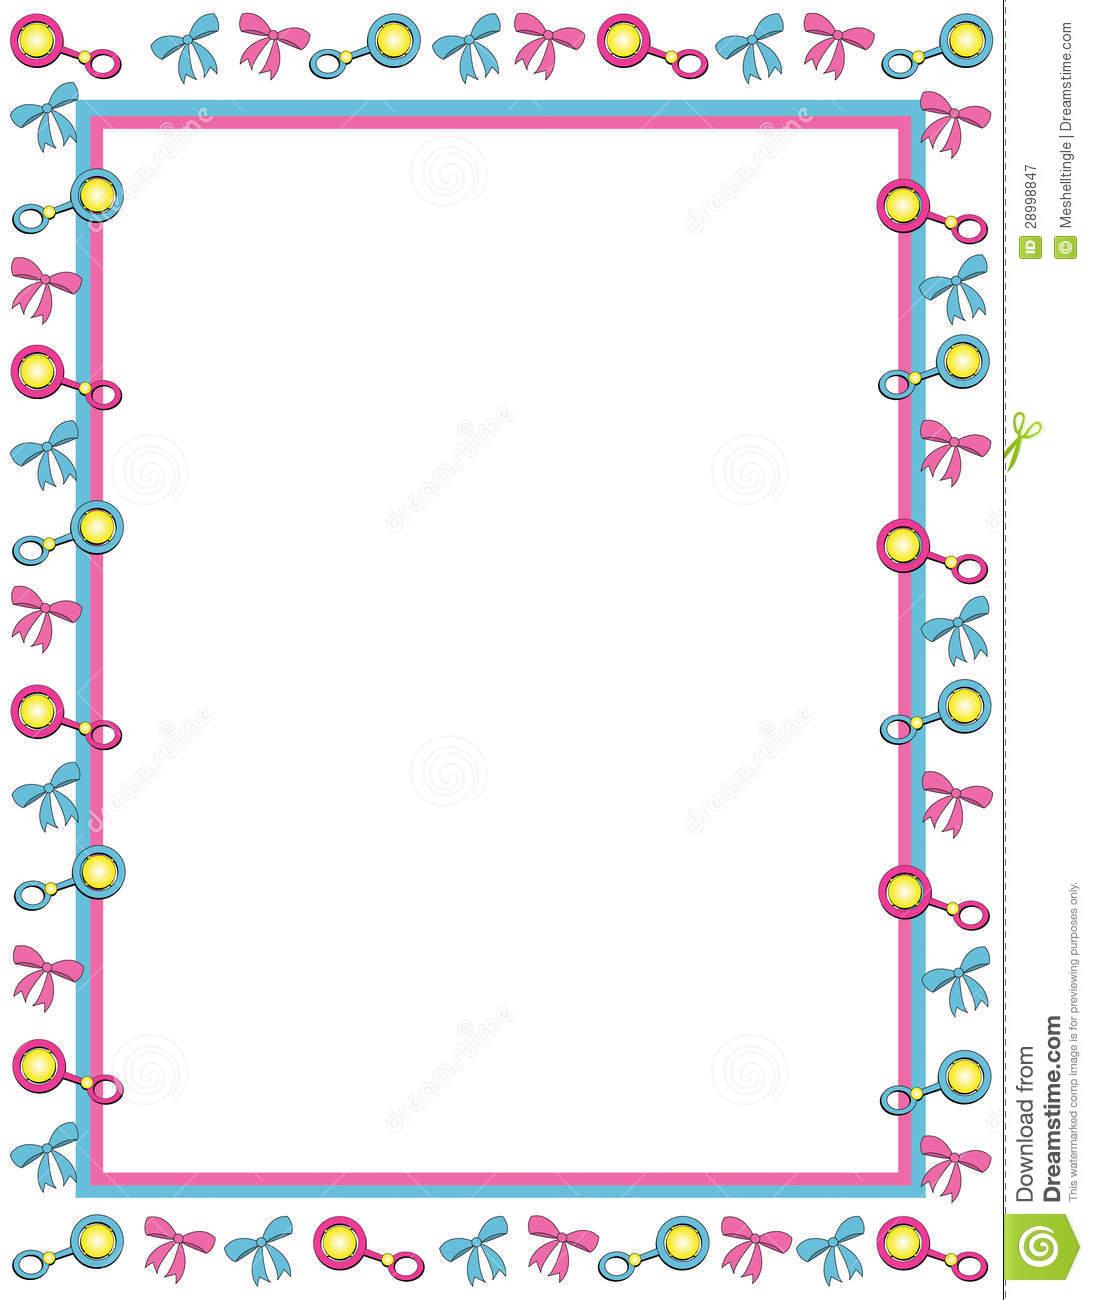 Free Baby Borders Clip Art Frames And Bo-Free Baby Borders Clip Art Frames And Borders For Babies Cartoon Frame-14